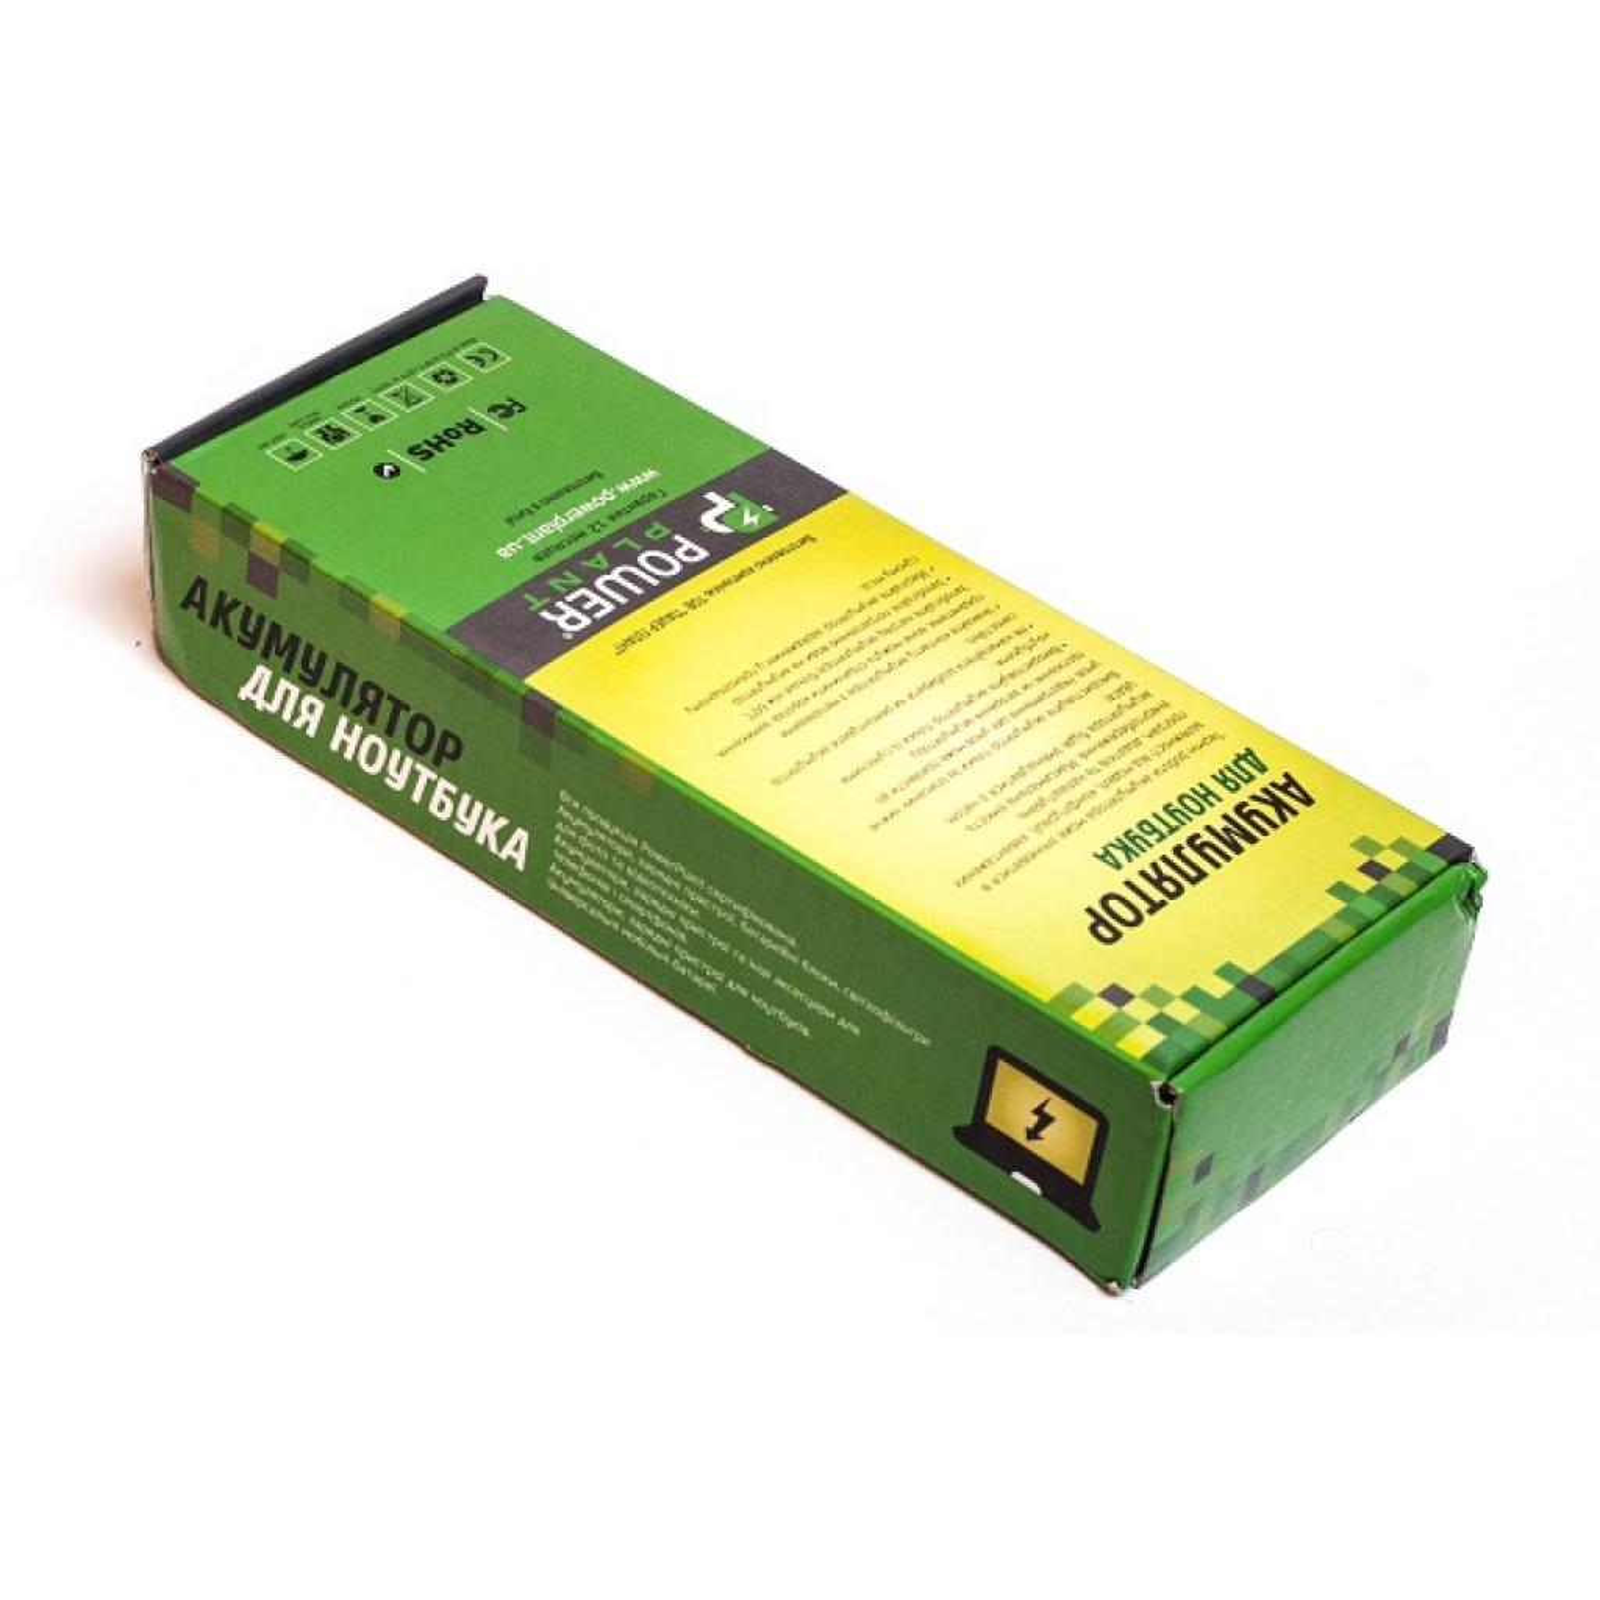 Аккумулятор для ноутбука HP 4510S (HSTNN-IB88, H4710LH) 14.4V 5200mAh PowerPlant (NB00000079) изображение 2